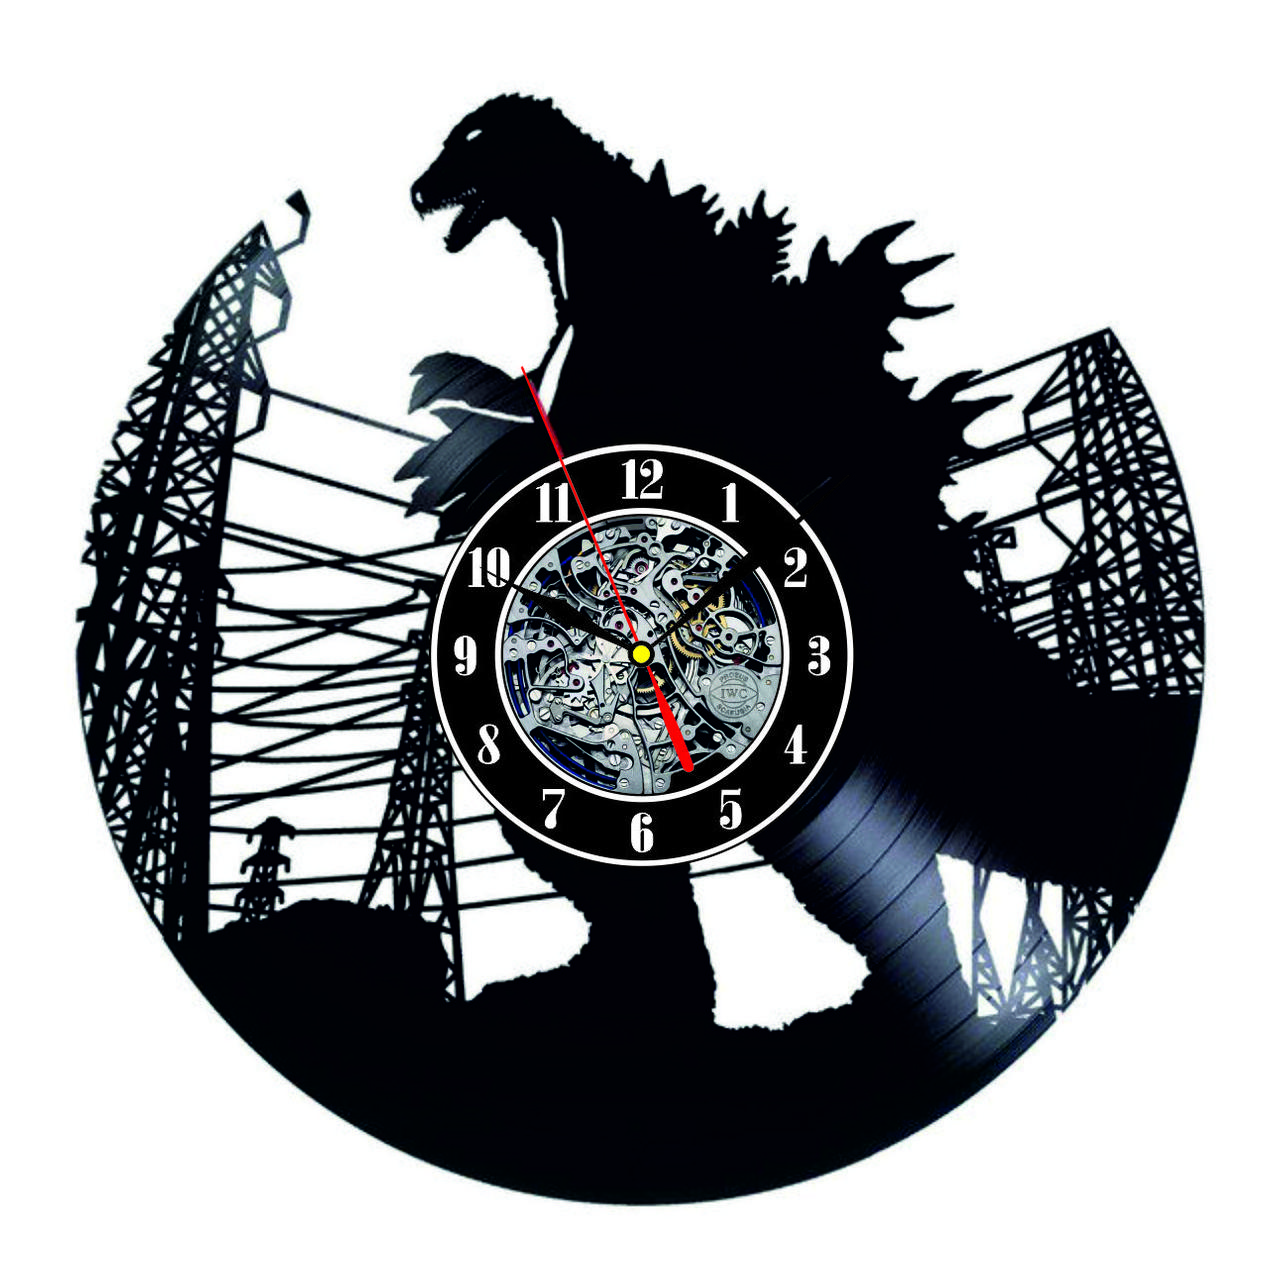 Настенные часы из виниловых пластинок LikeMark Godzilla